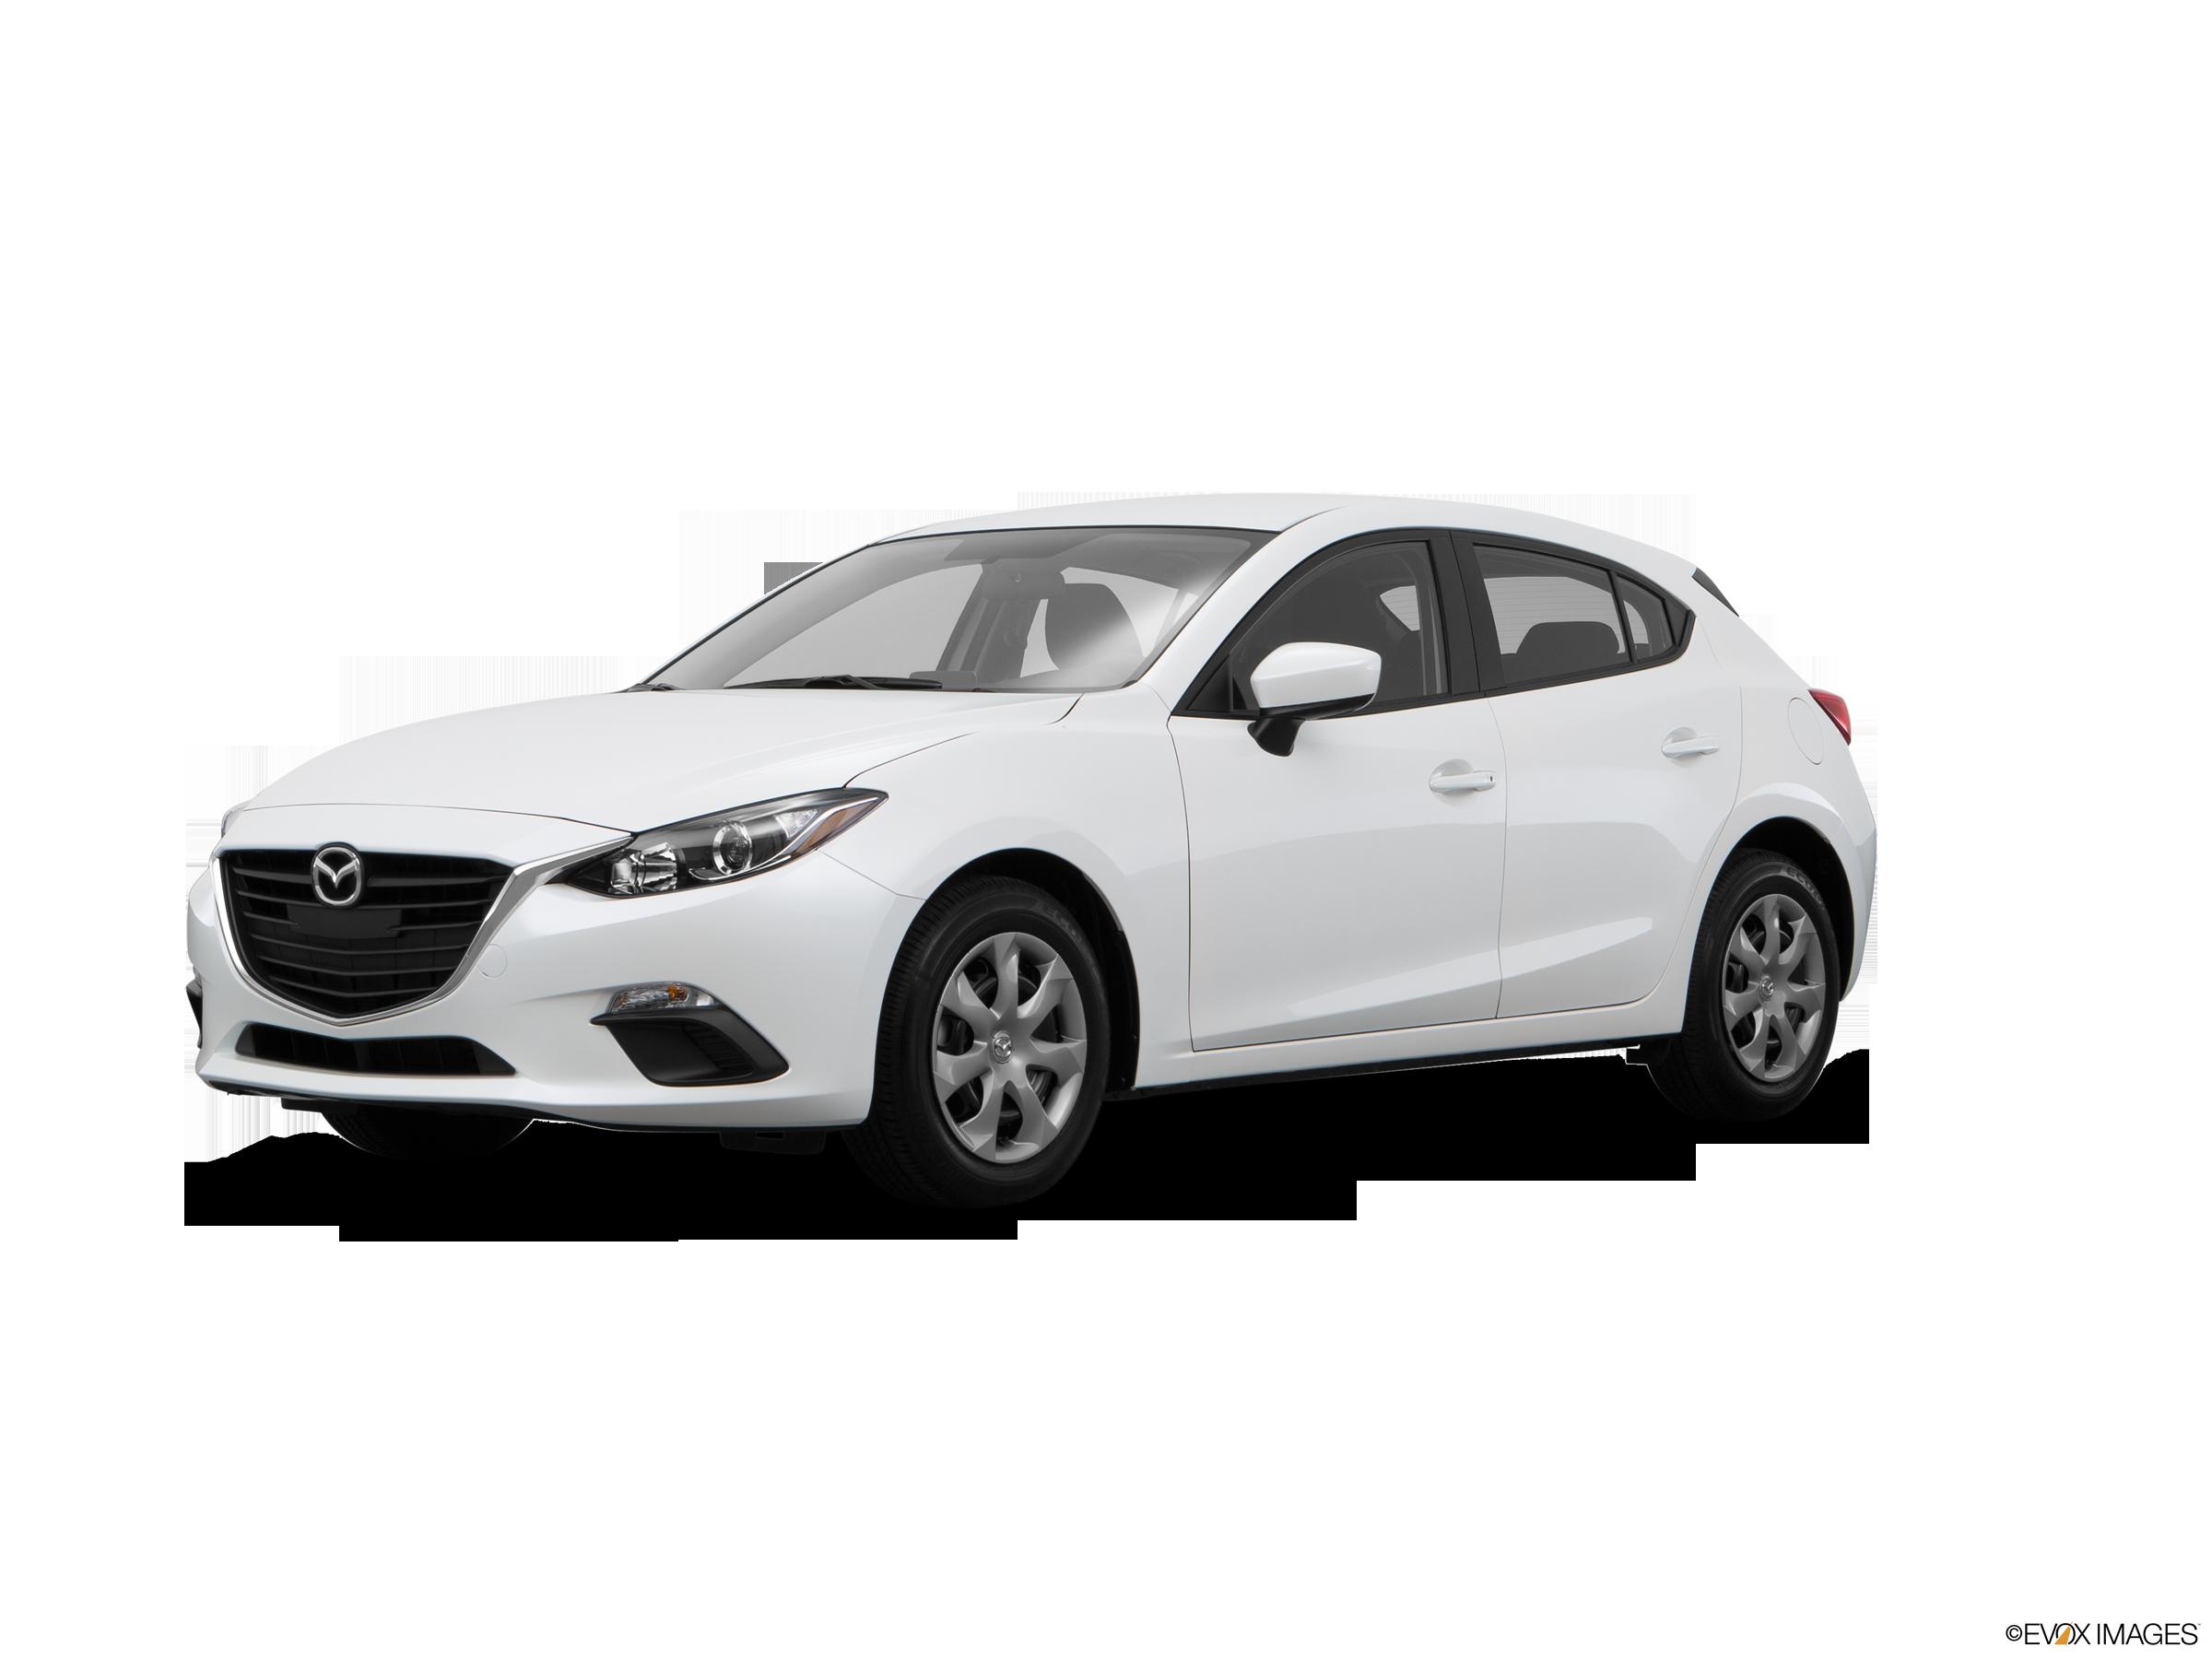 Kekurangan Mazda 3 Hatchback 2015 Harga